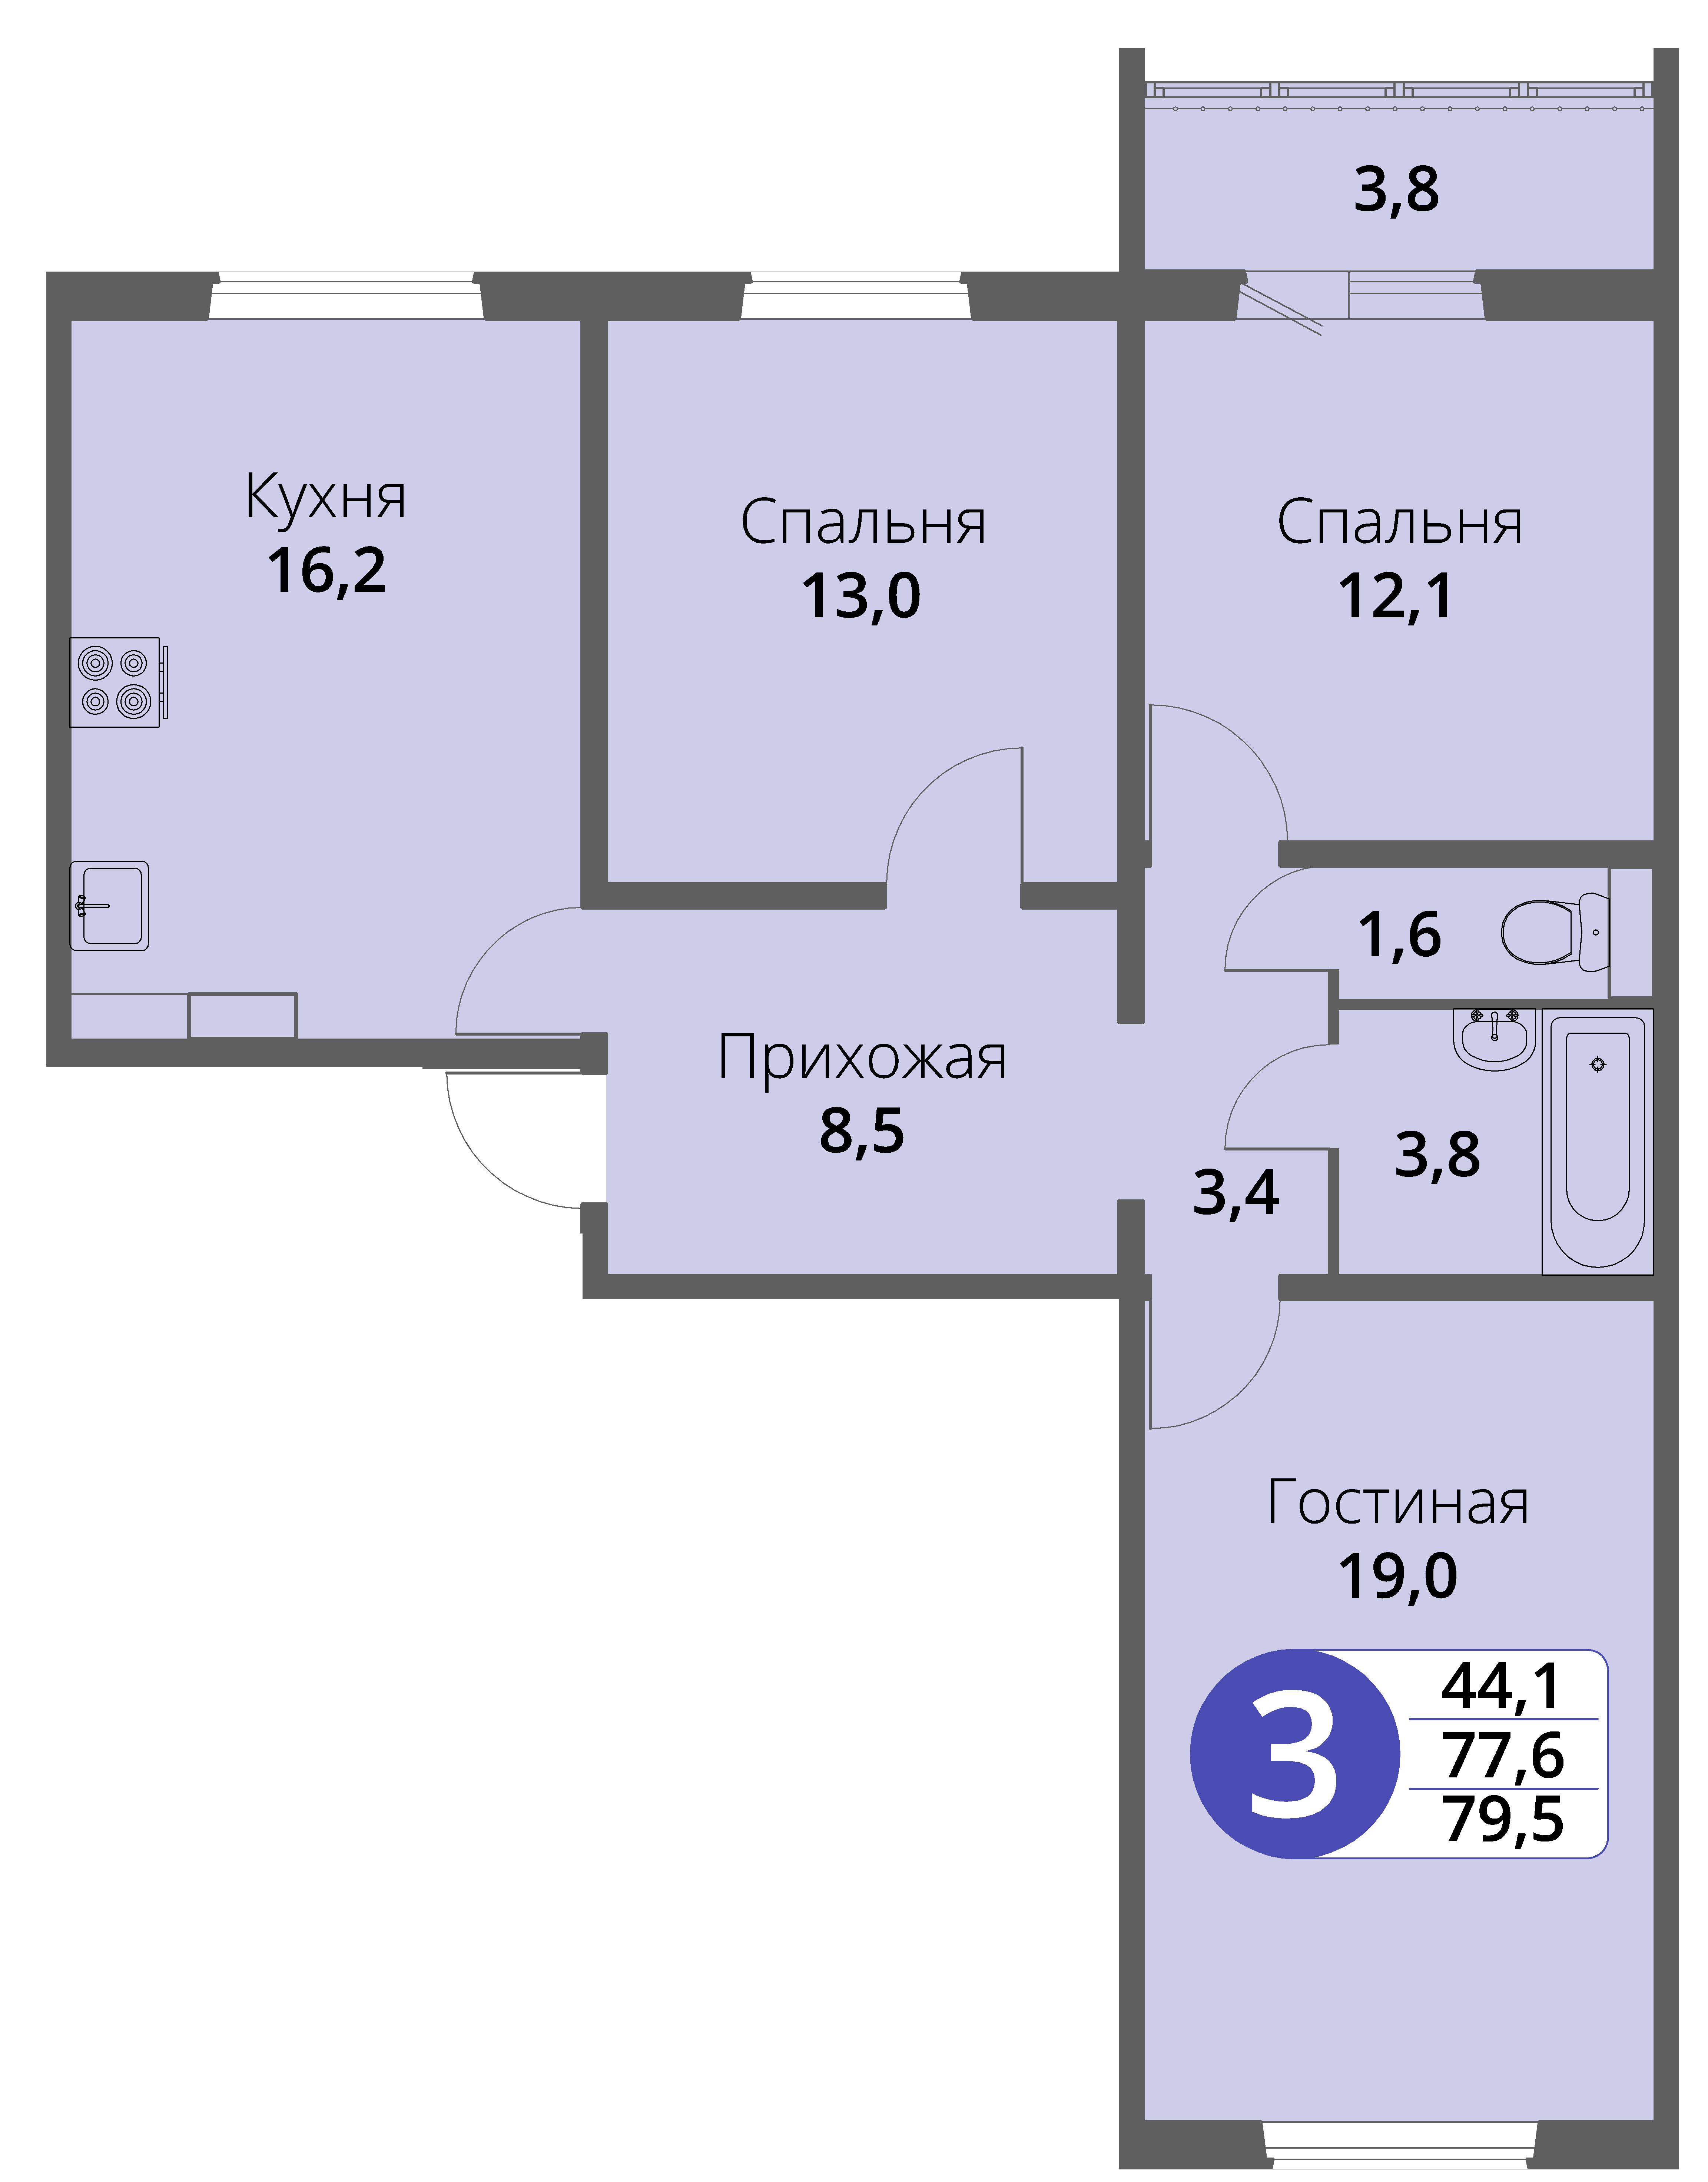 Зареченская 1-2, квартира 121 - Трехкомнатная